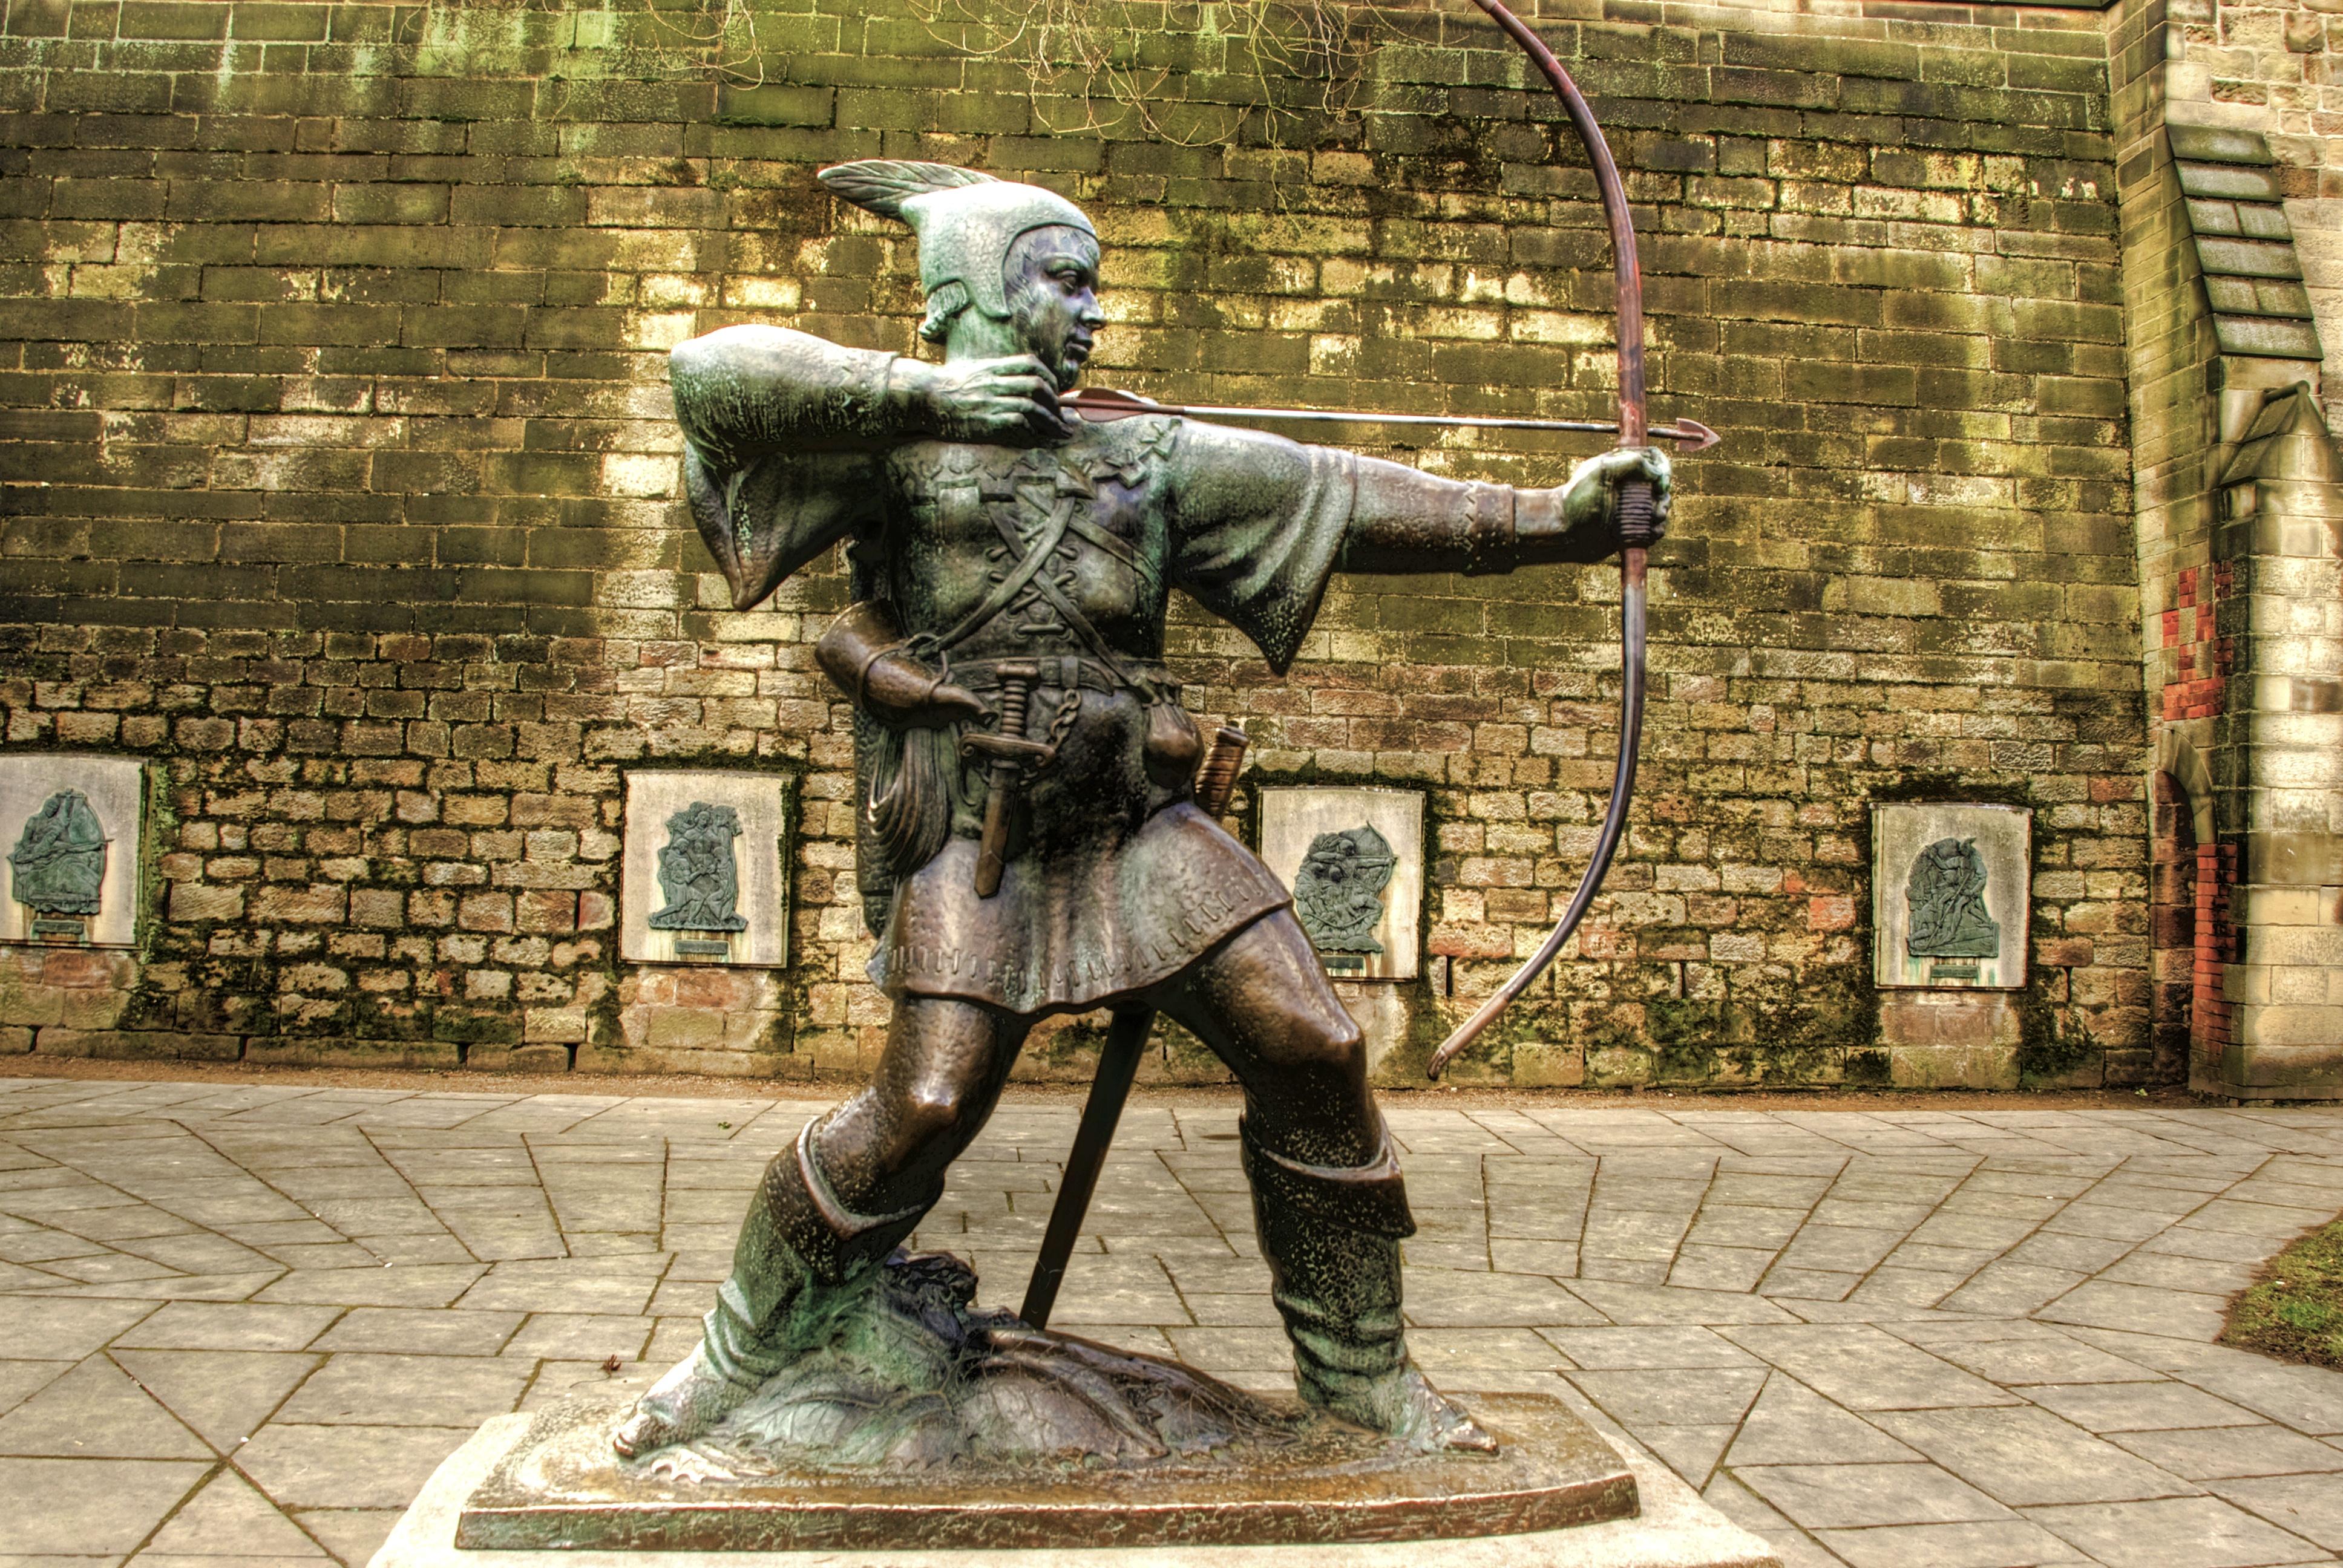 Robin Hood statue, Nottingham Castle, England.